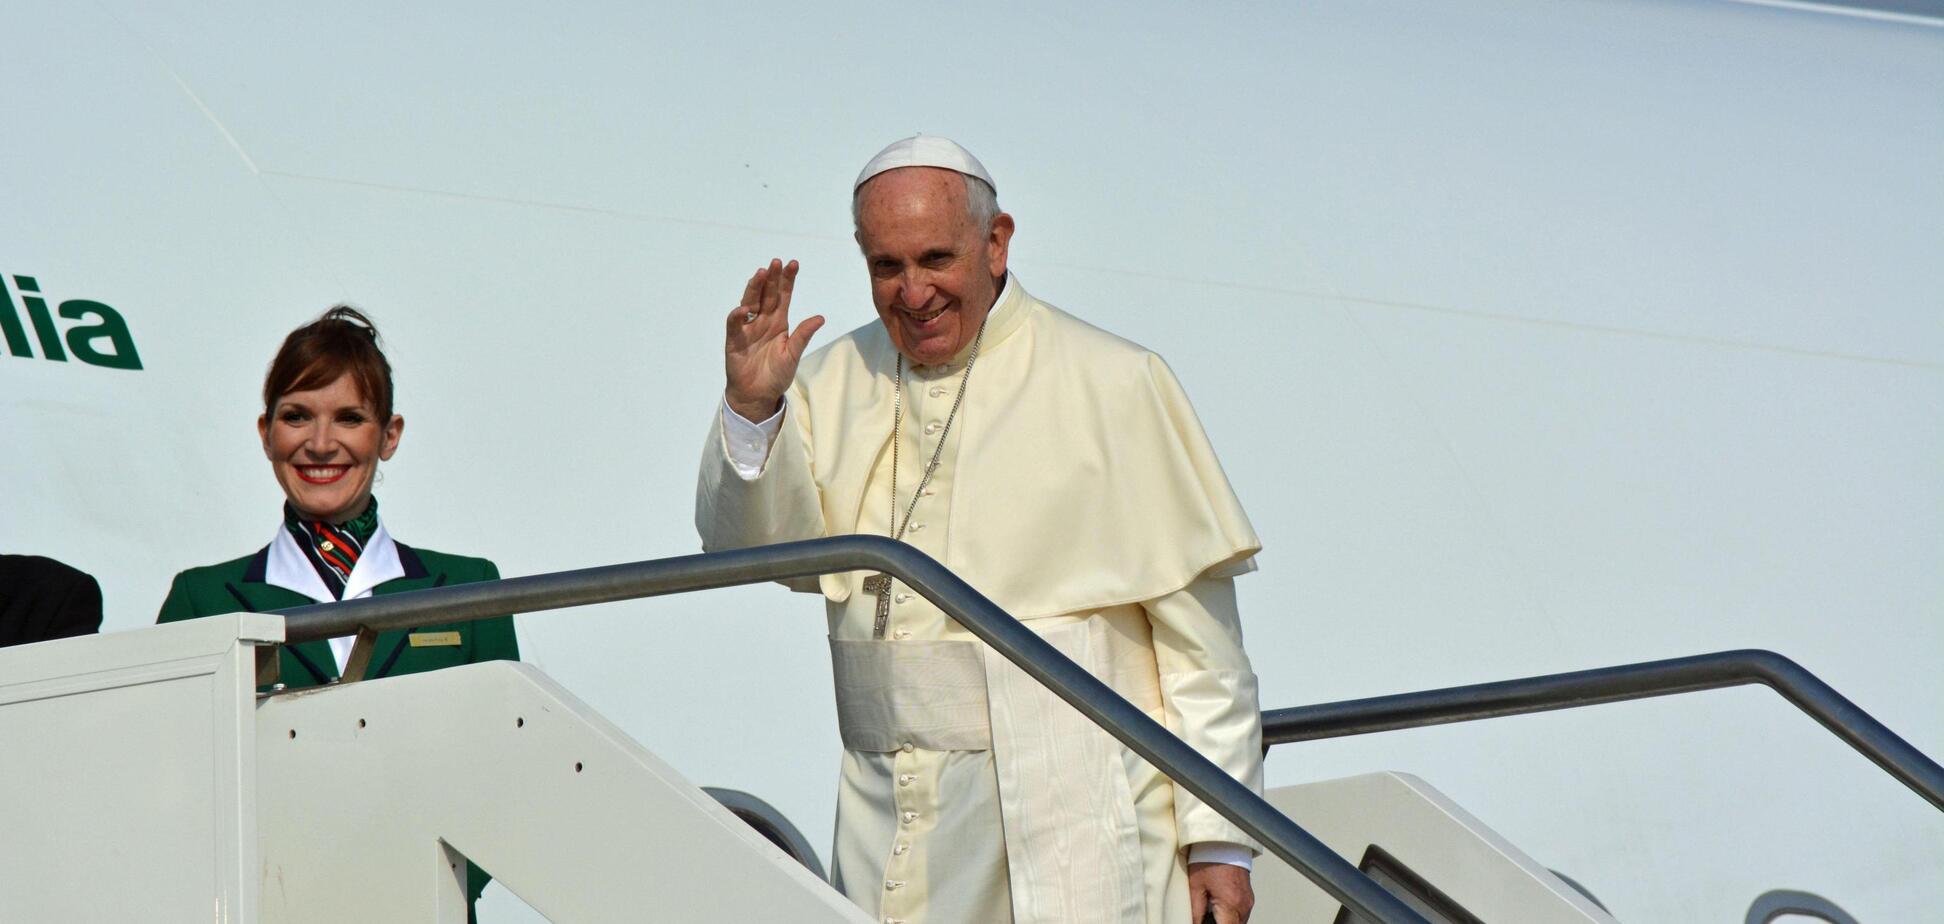 Папа Франциск благословил брак… в воздухе